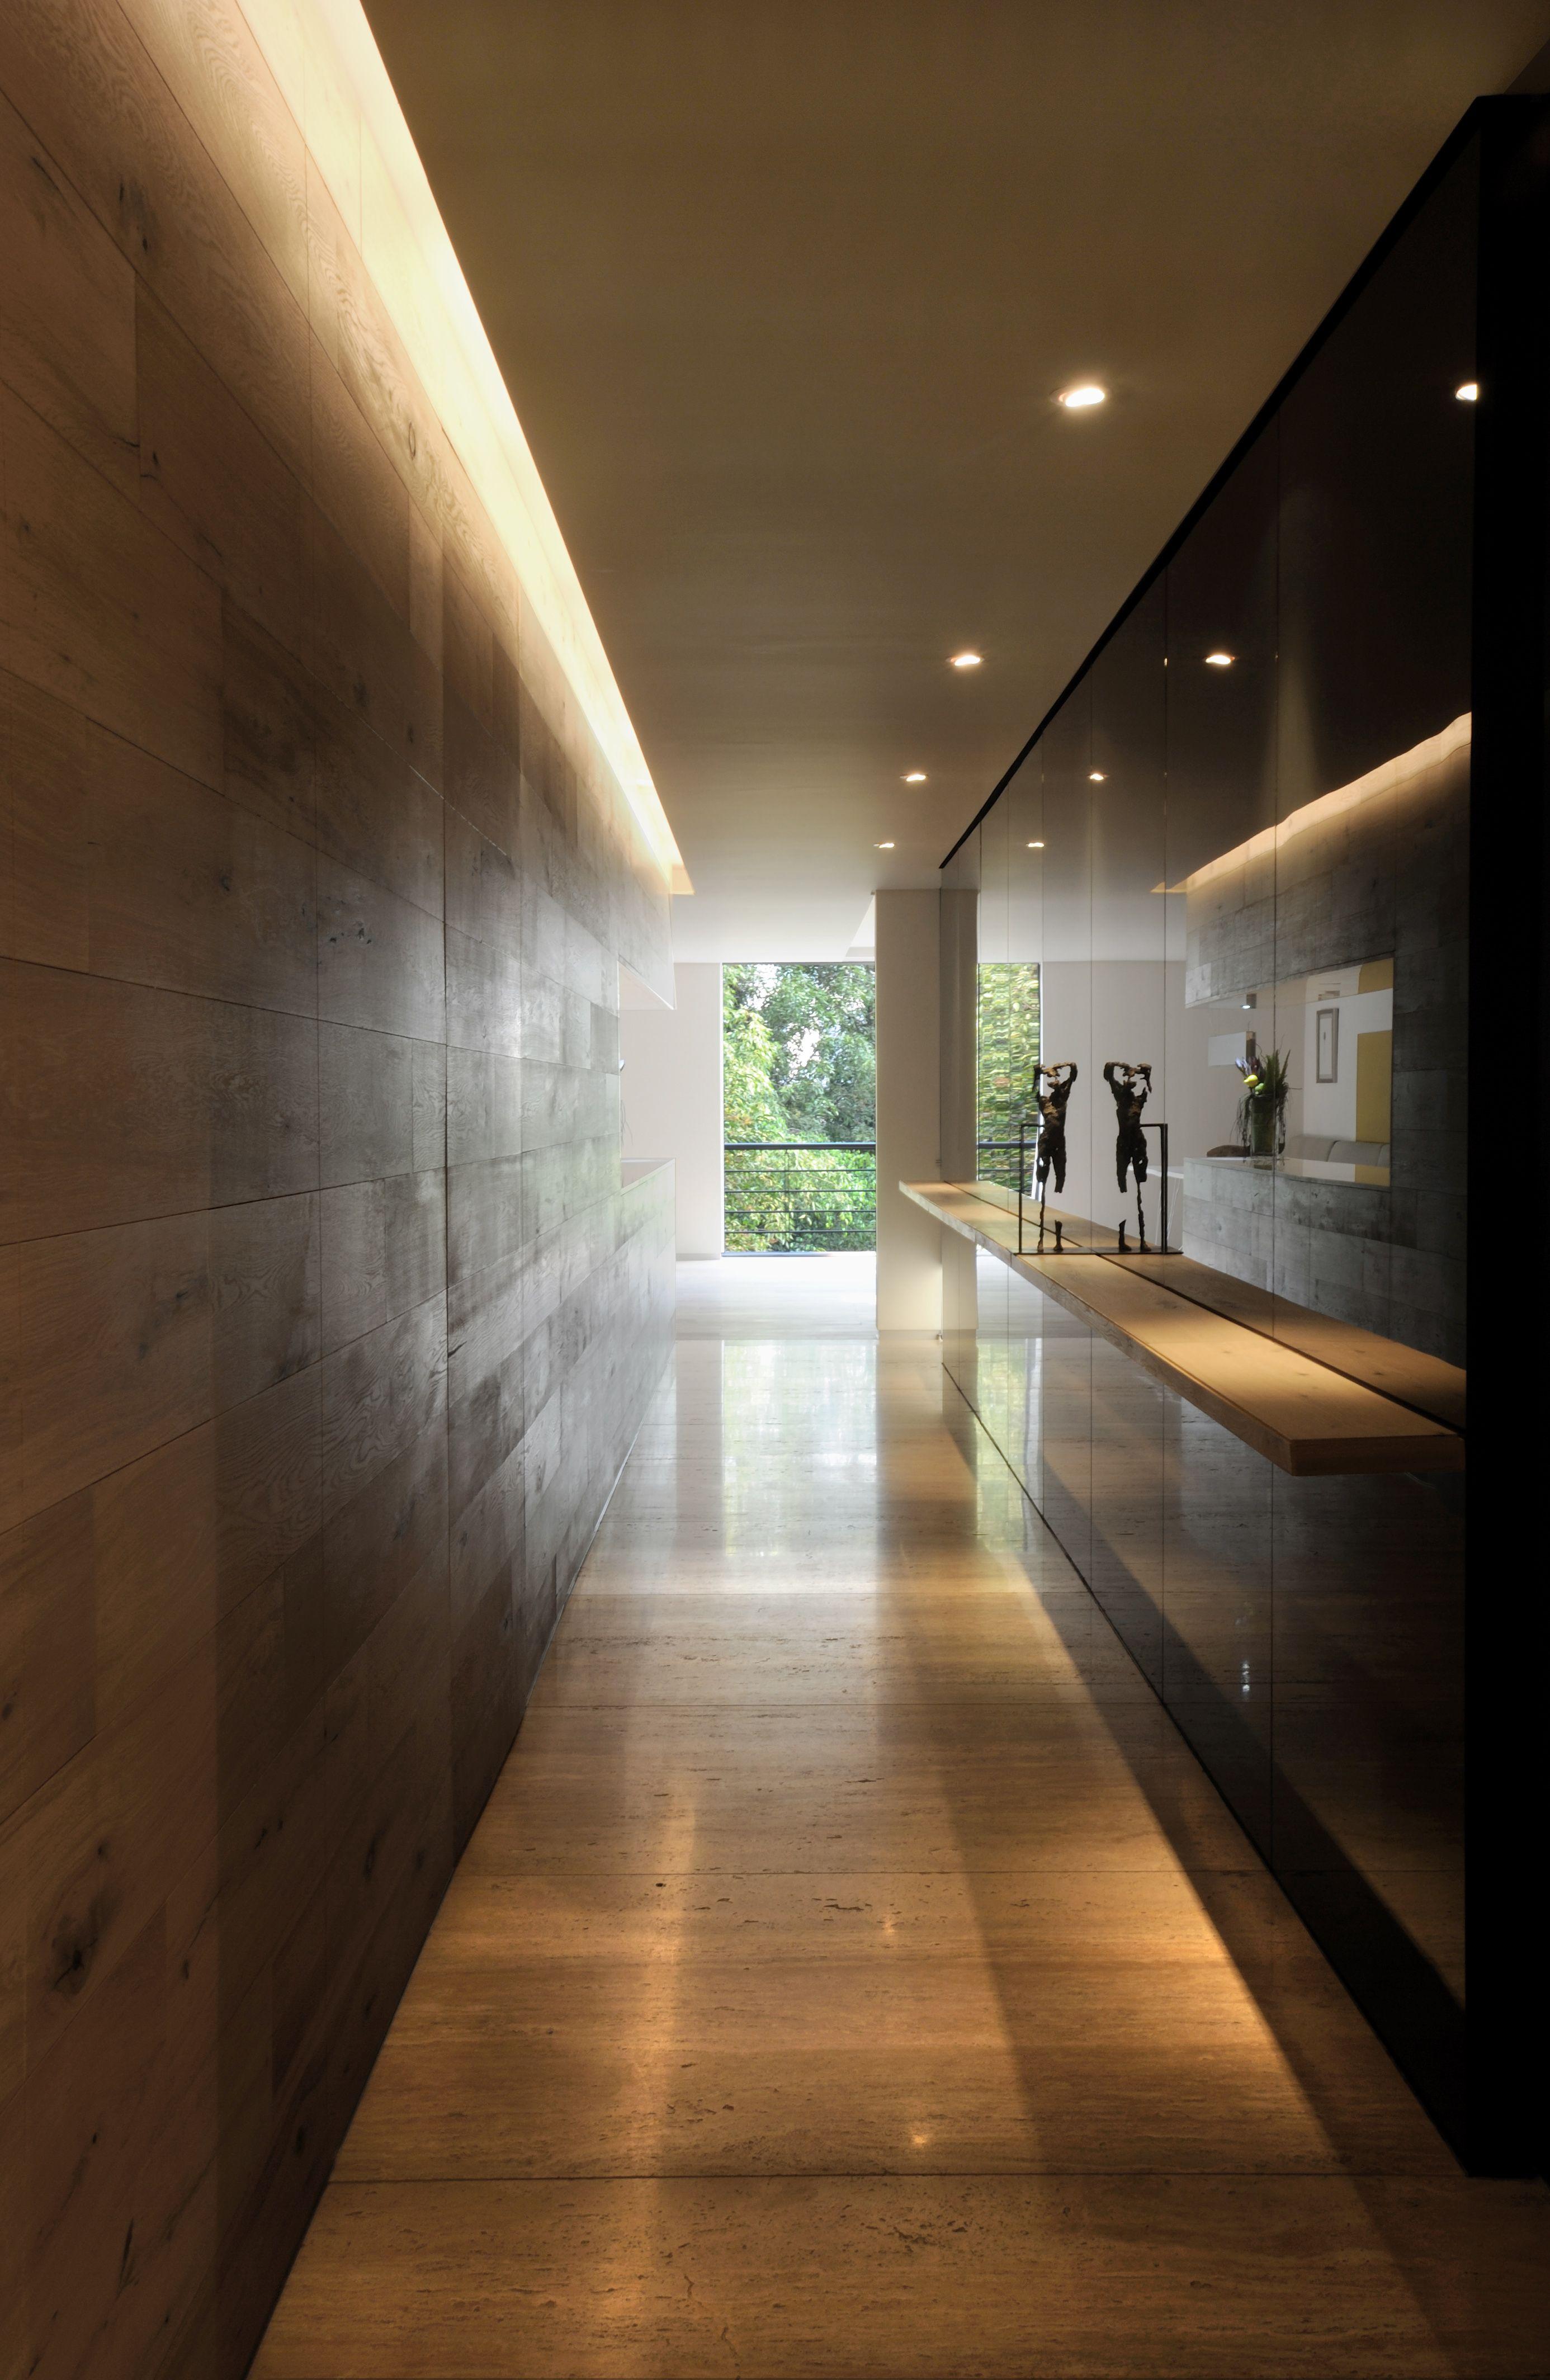 Foseado falso techo iluminado interior design spaces - Decoracion falsos techos ...